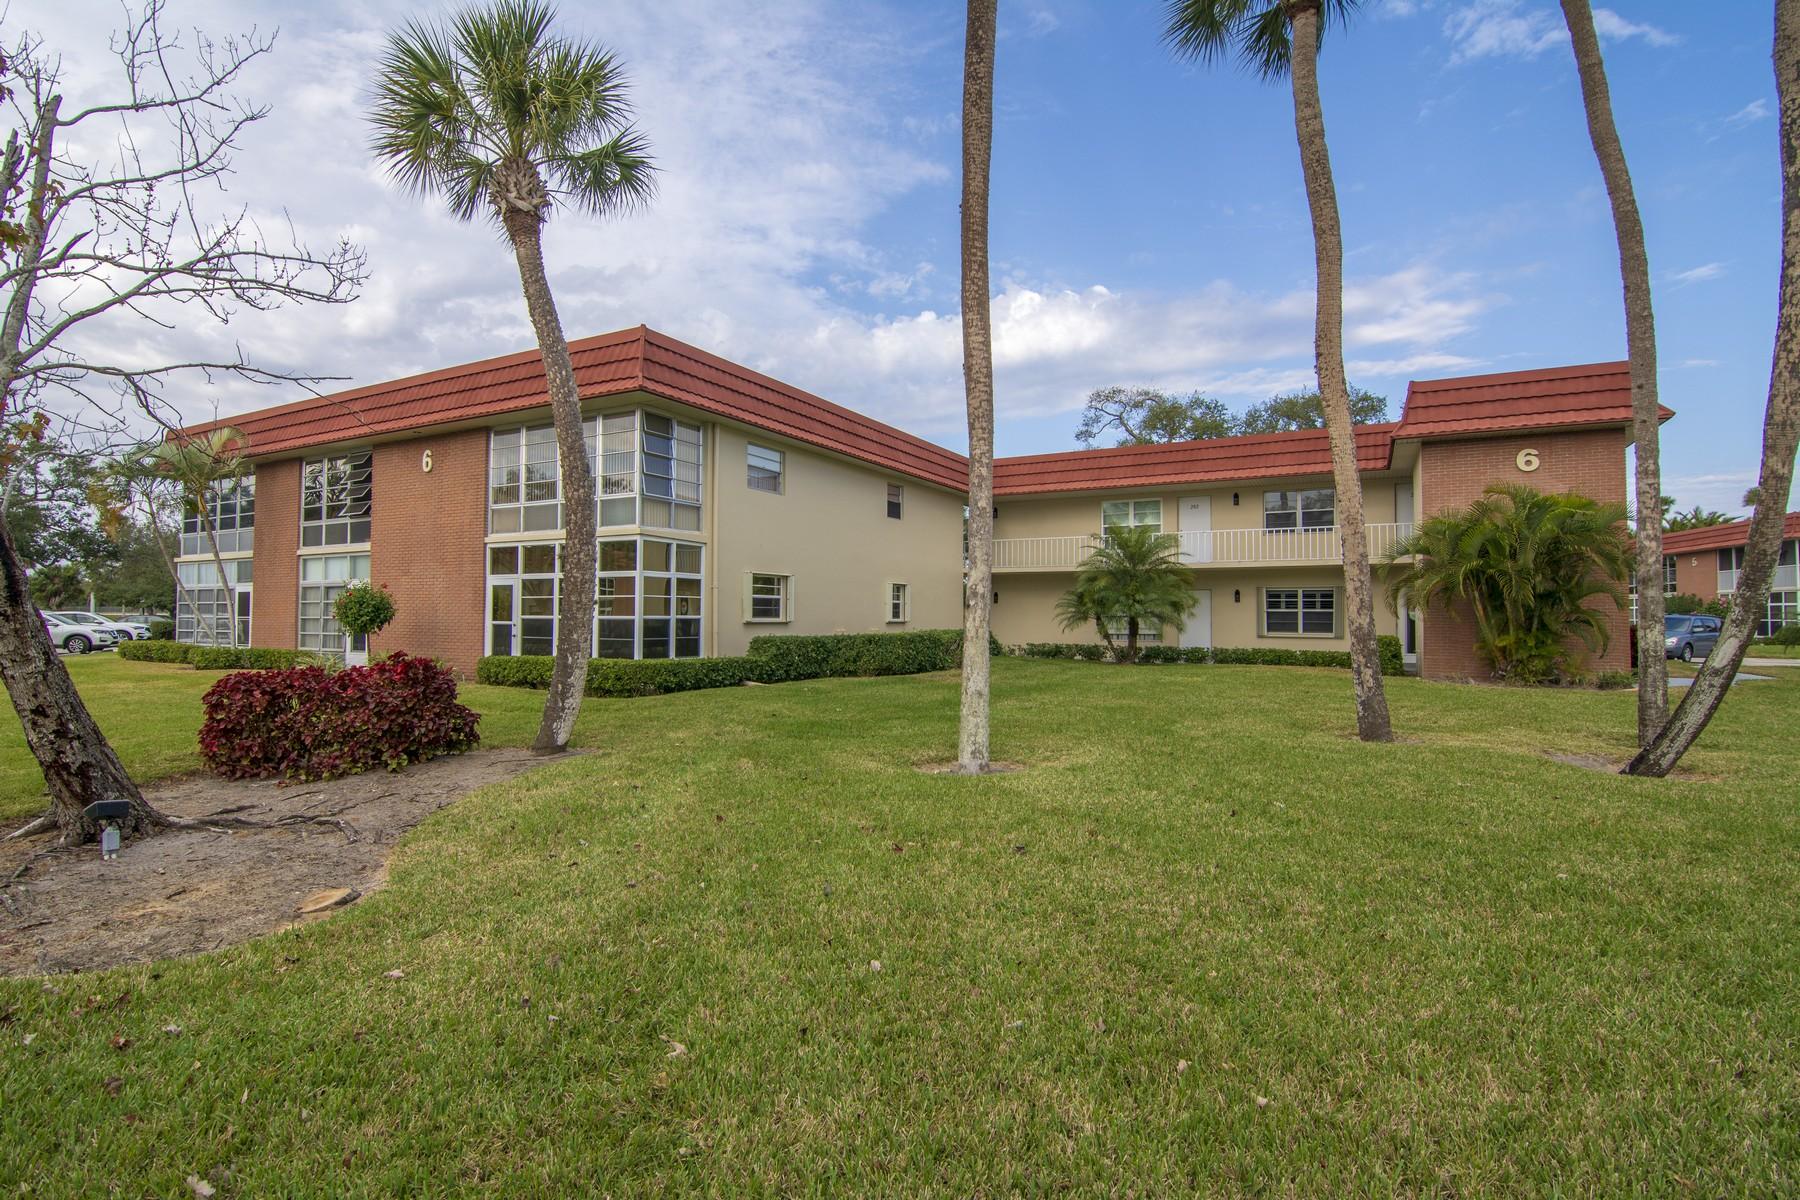 Condominium for Sale at Turn Key 55+ Condo in Excellent Condition 6 Vista Palm Lane #205 Vero Beach, Florida 32962 United States